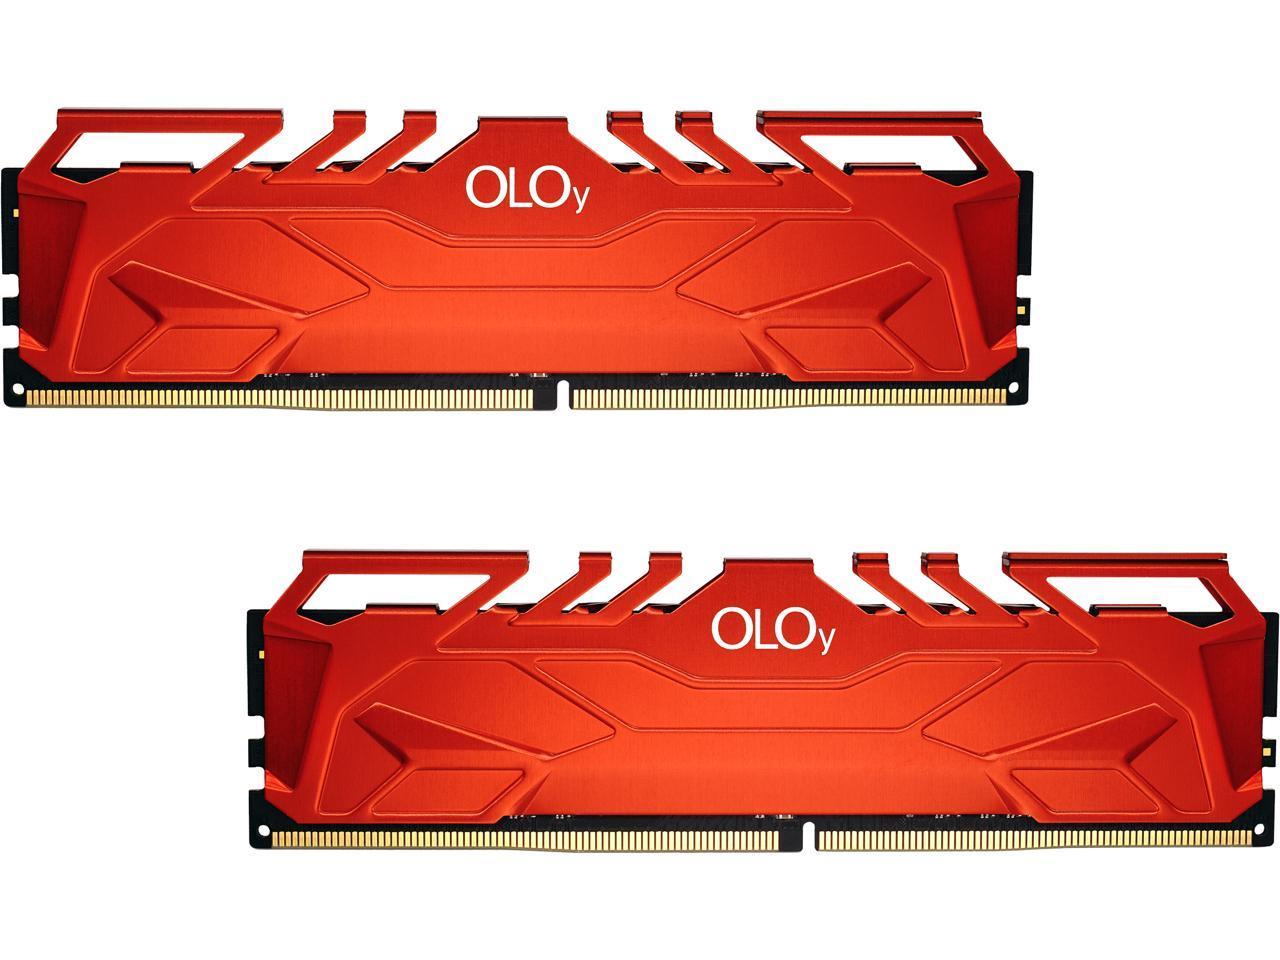 OLOy MD4U163216CFDA 32GB (2 x 16GB) PC4-25600 3200MHz DDR4 288-Pin DIMM Desktop Memory + Team Group 120GB SSD